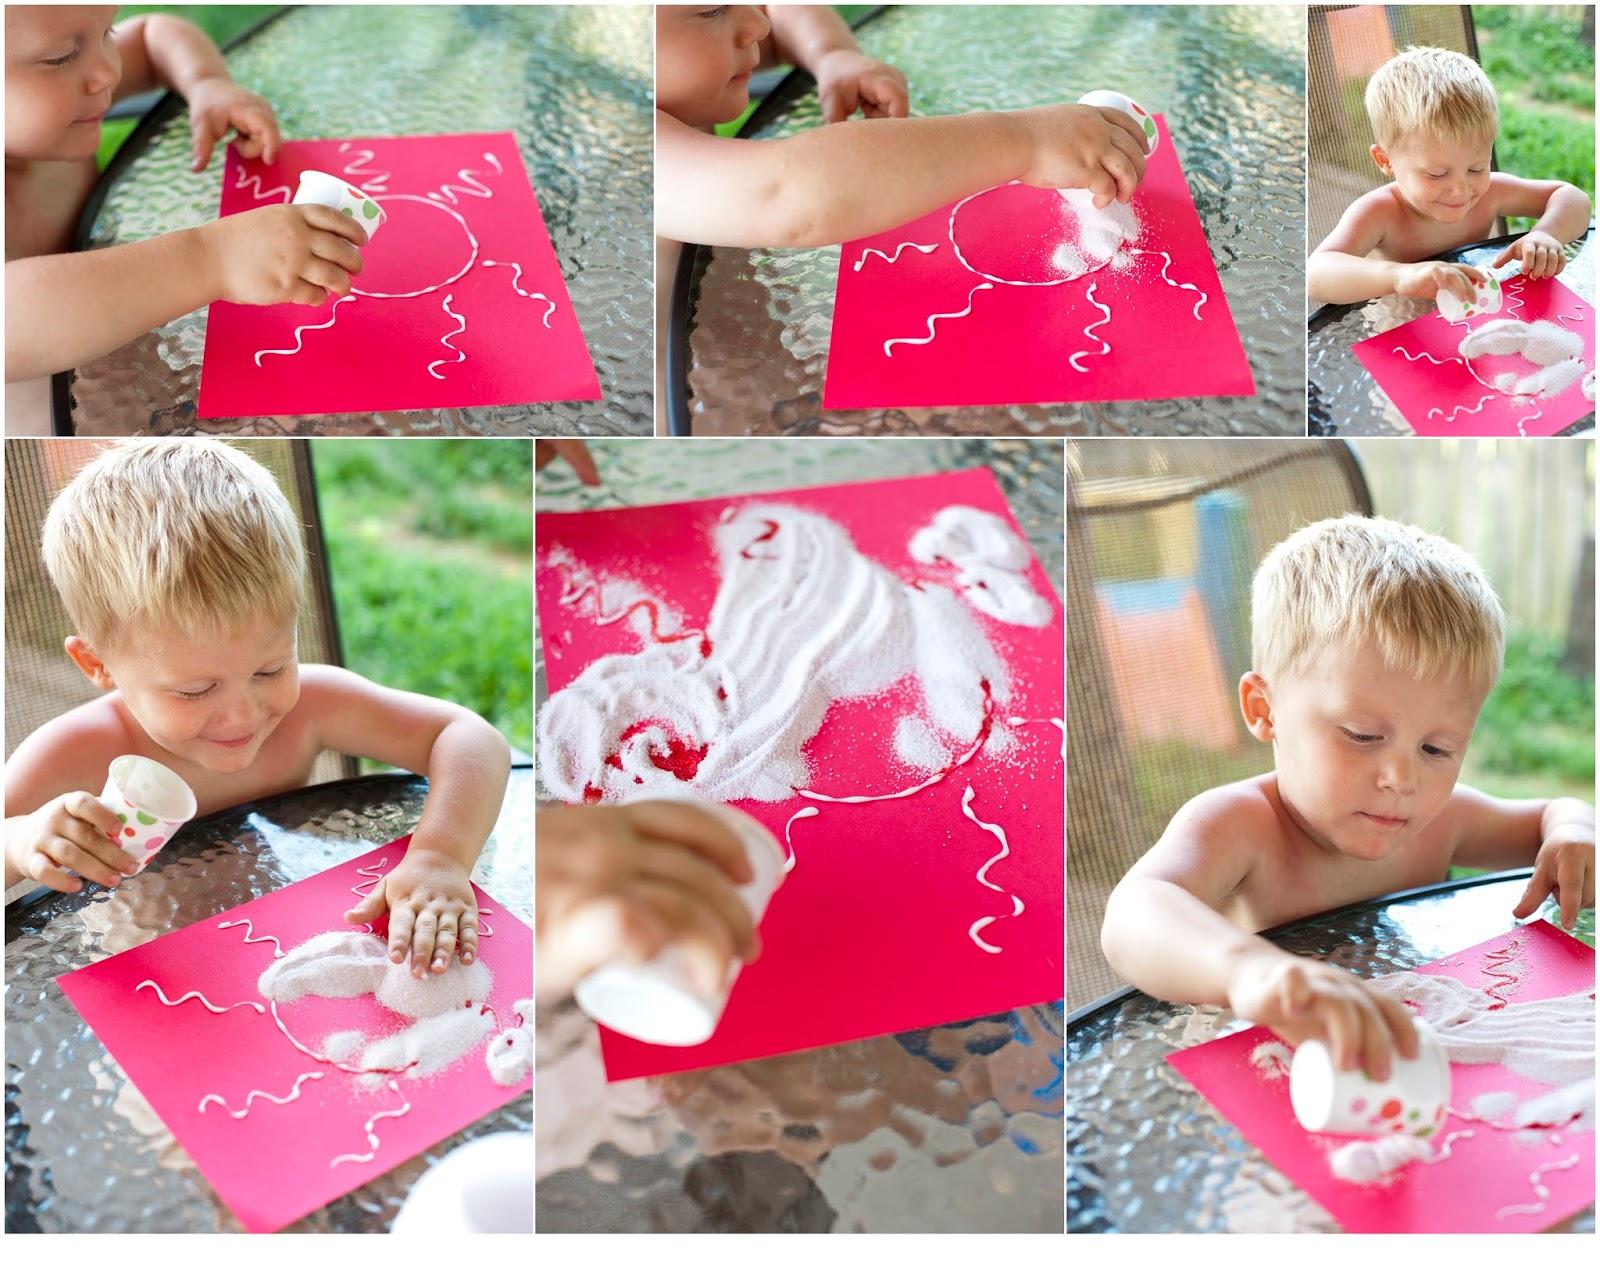 Summer play ideas - edible sparkle art